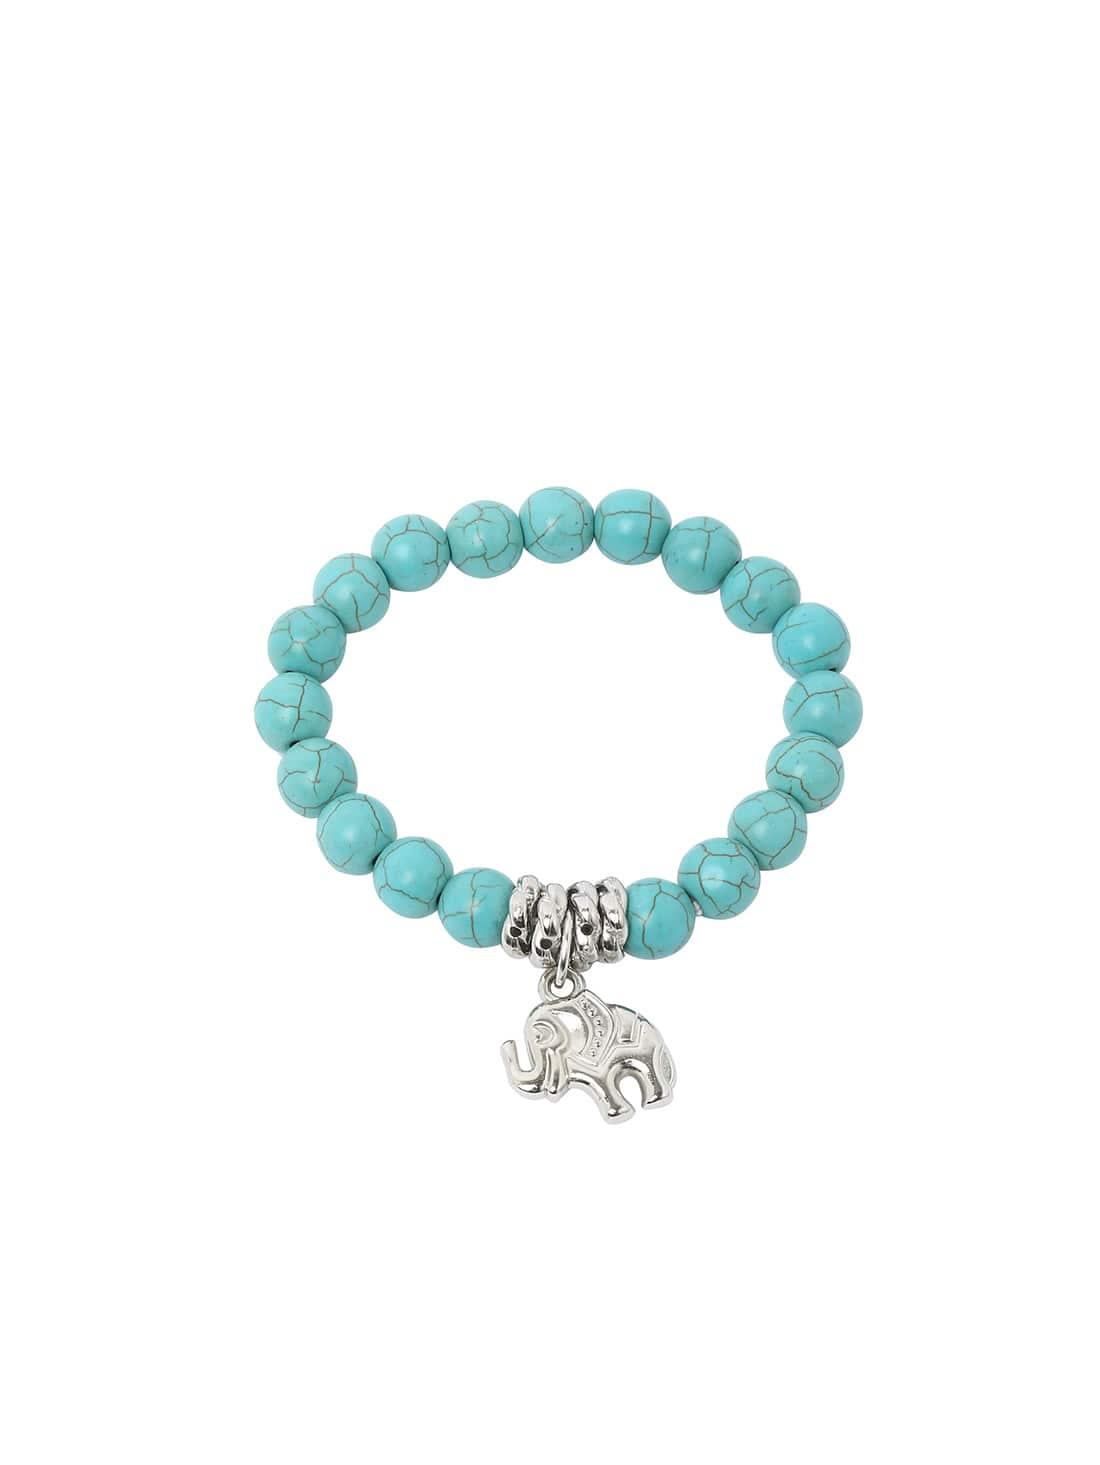 Turquoise Beads Silver Plated Elephant Bracelet